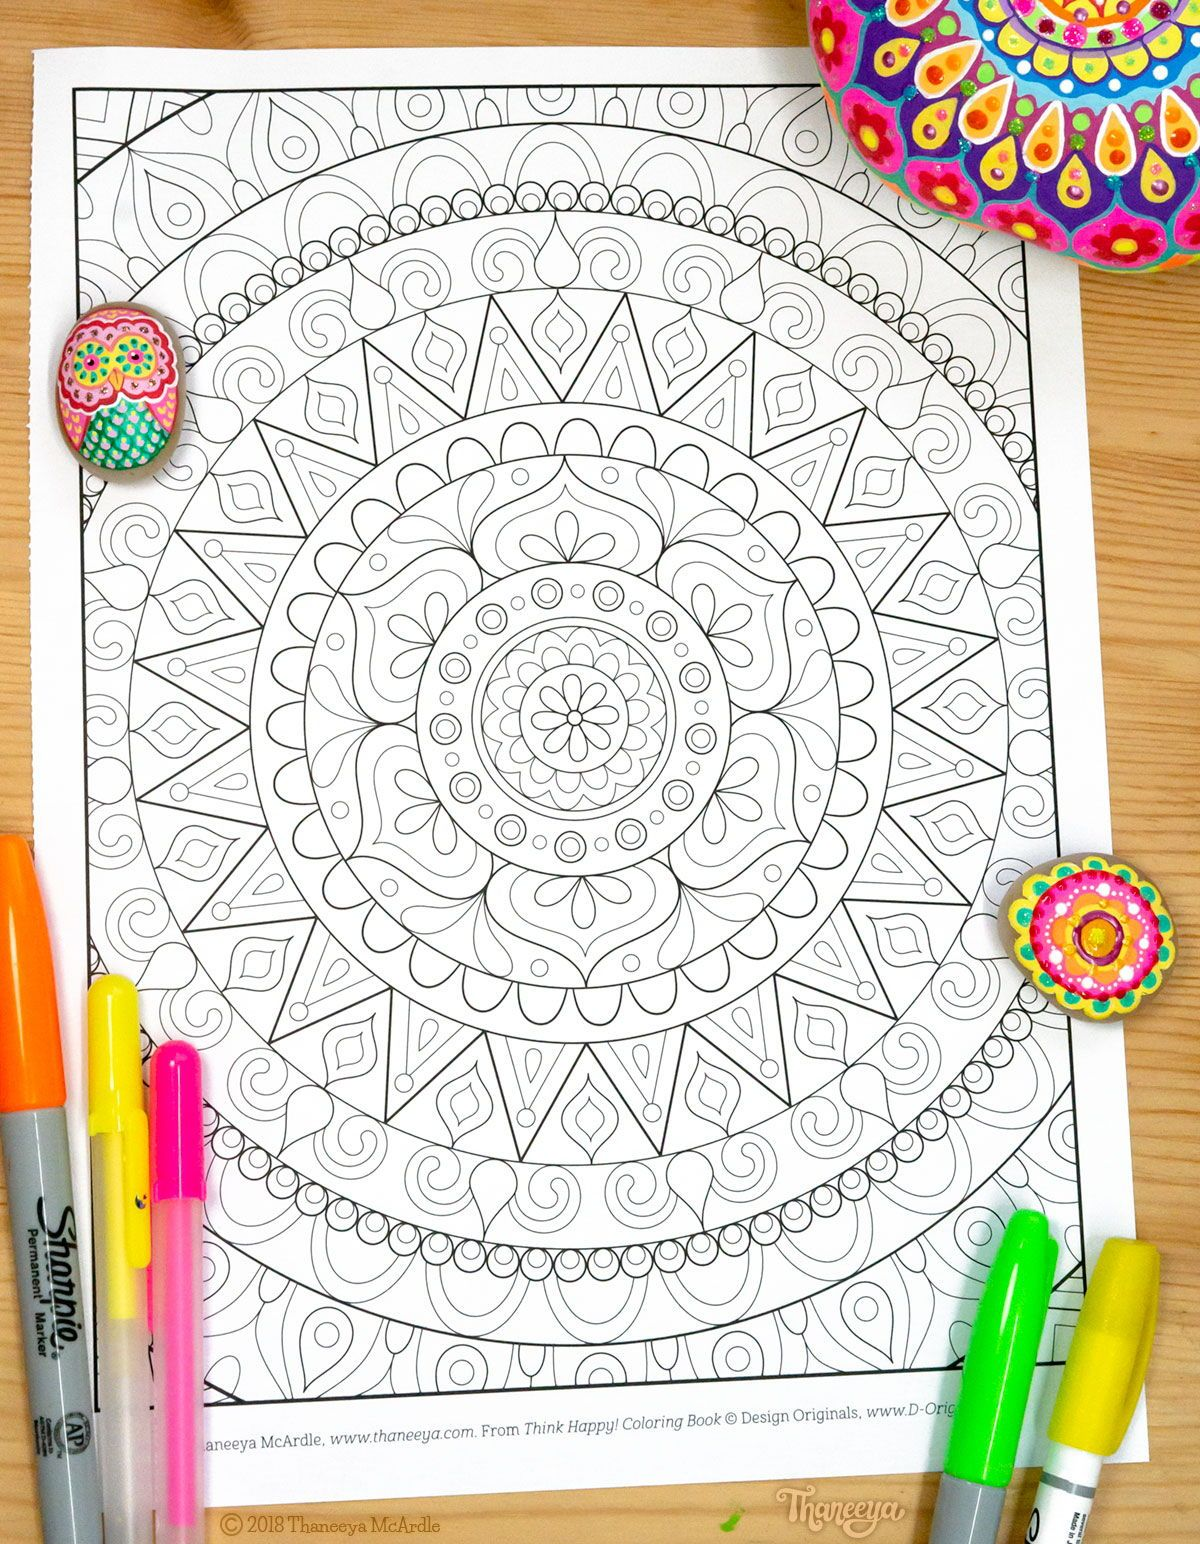 Mandala Coloring Page From Thaneeya Mcardle S Think Happy Coloring Book Coloring Books Mandala Coloring Pages Coloring Pages